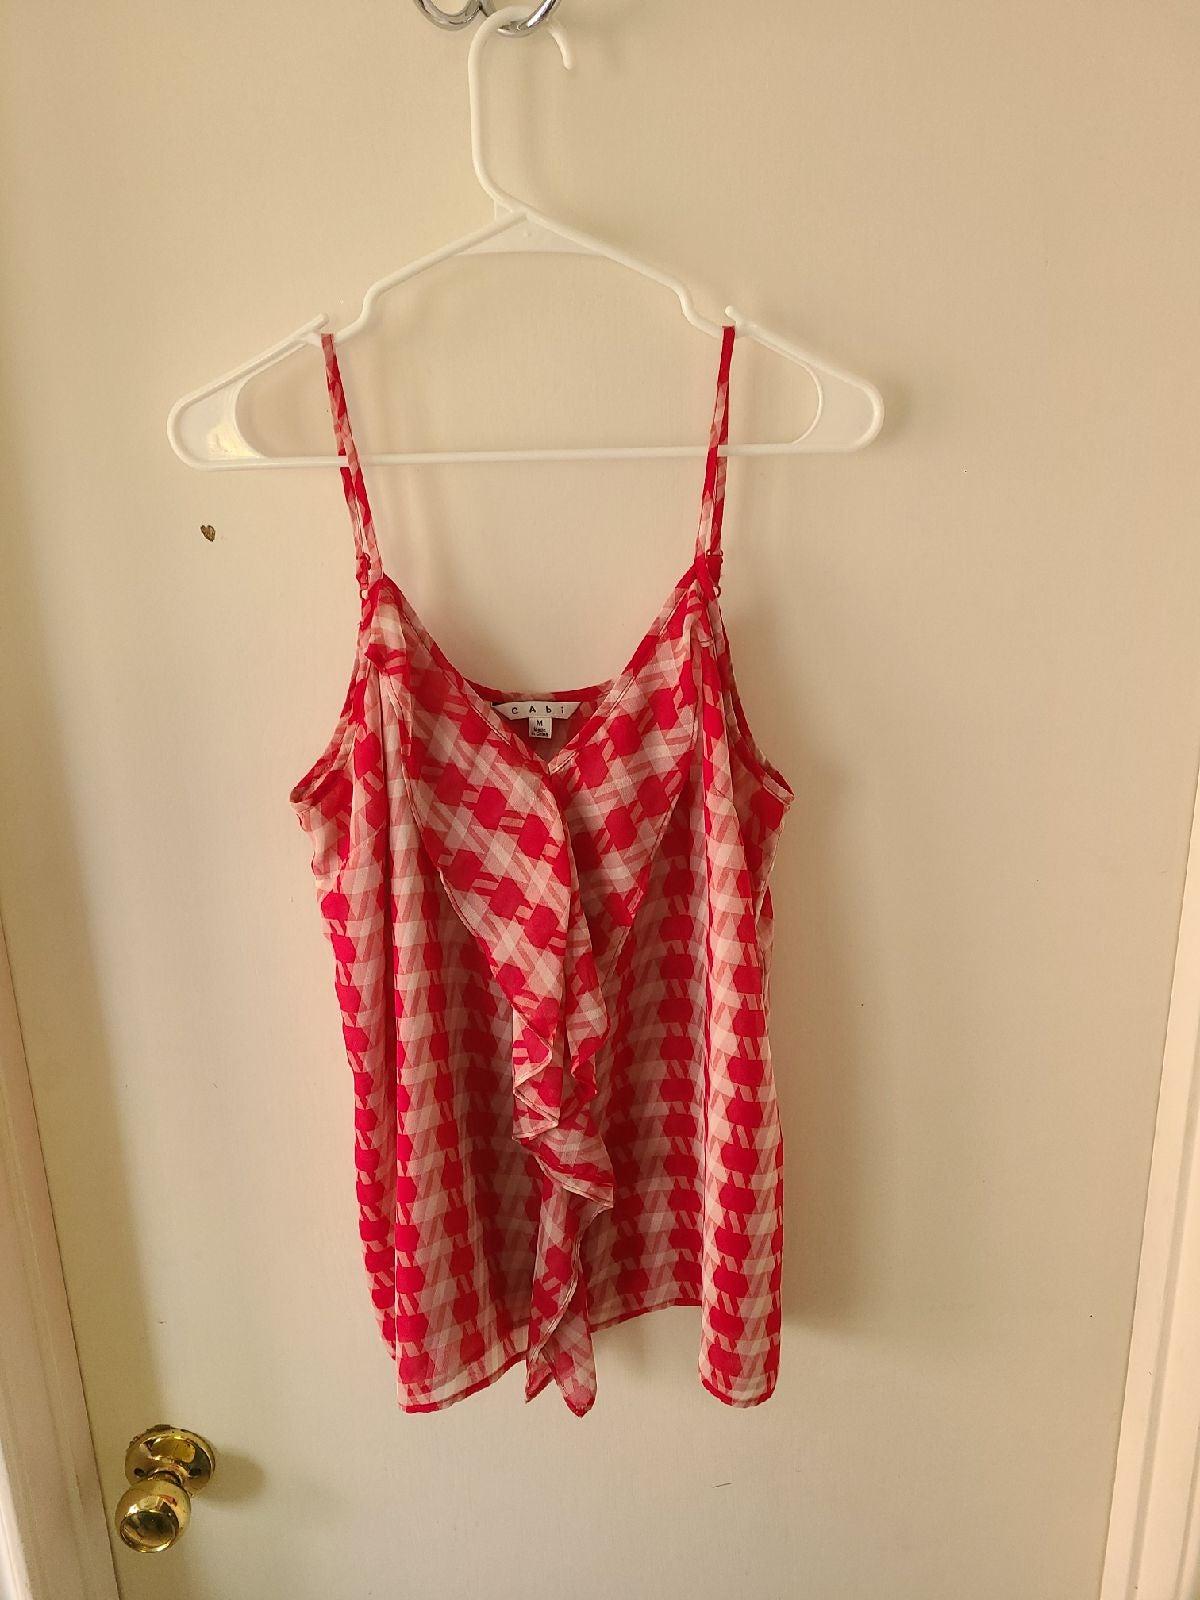 Cabi Red and white spaghetti strap tank